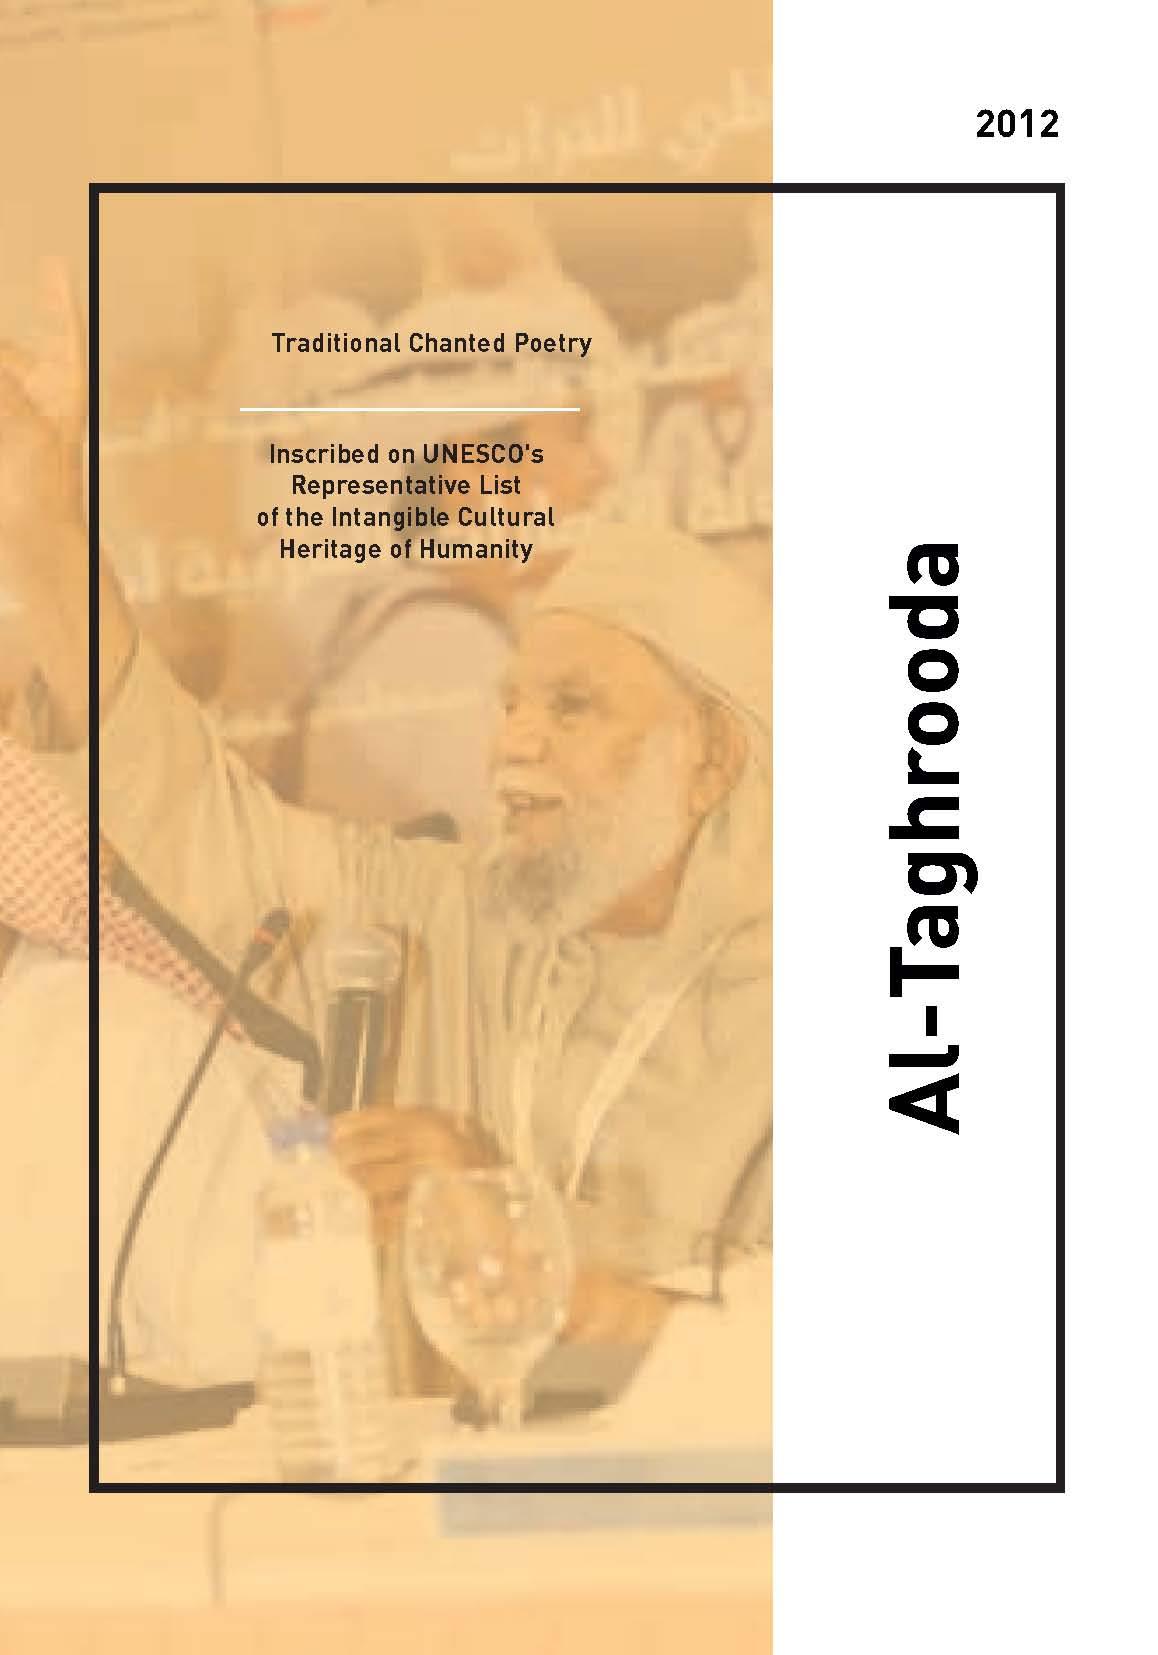 Al-Taghrooda